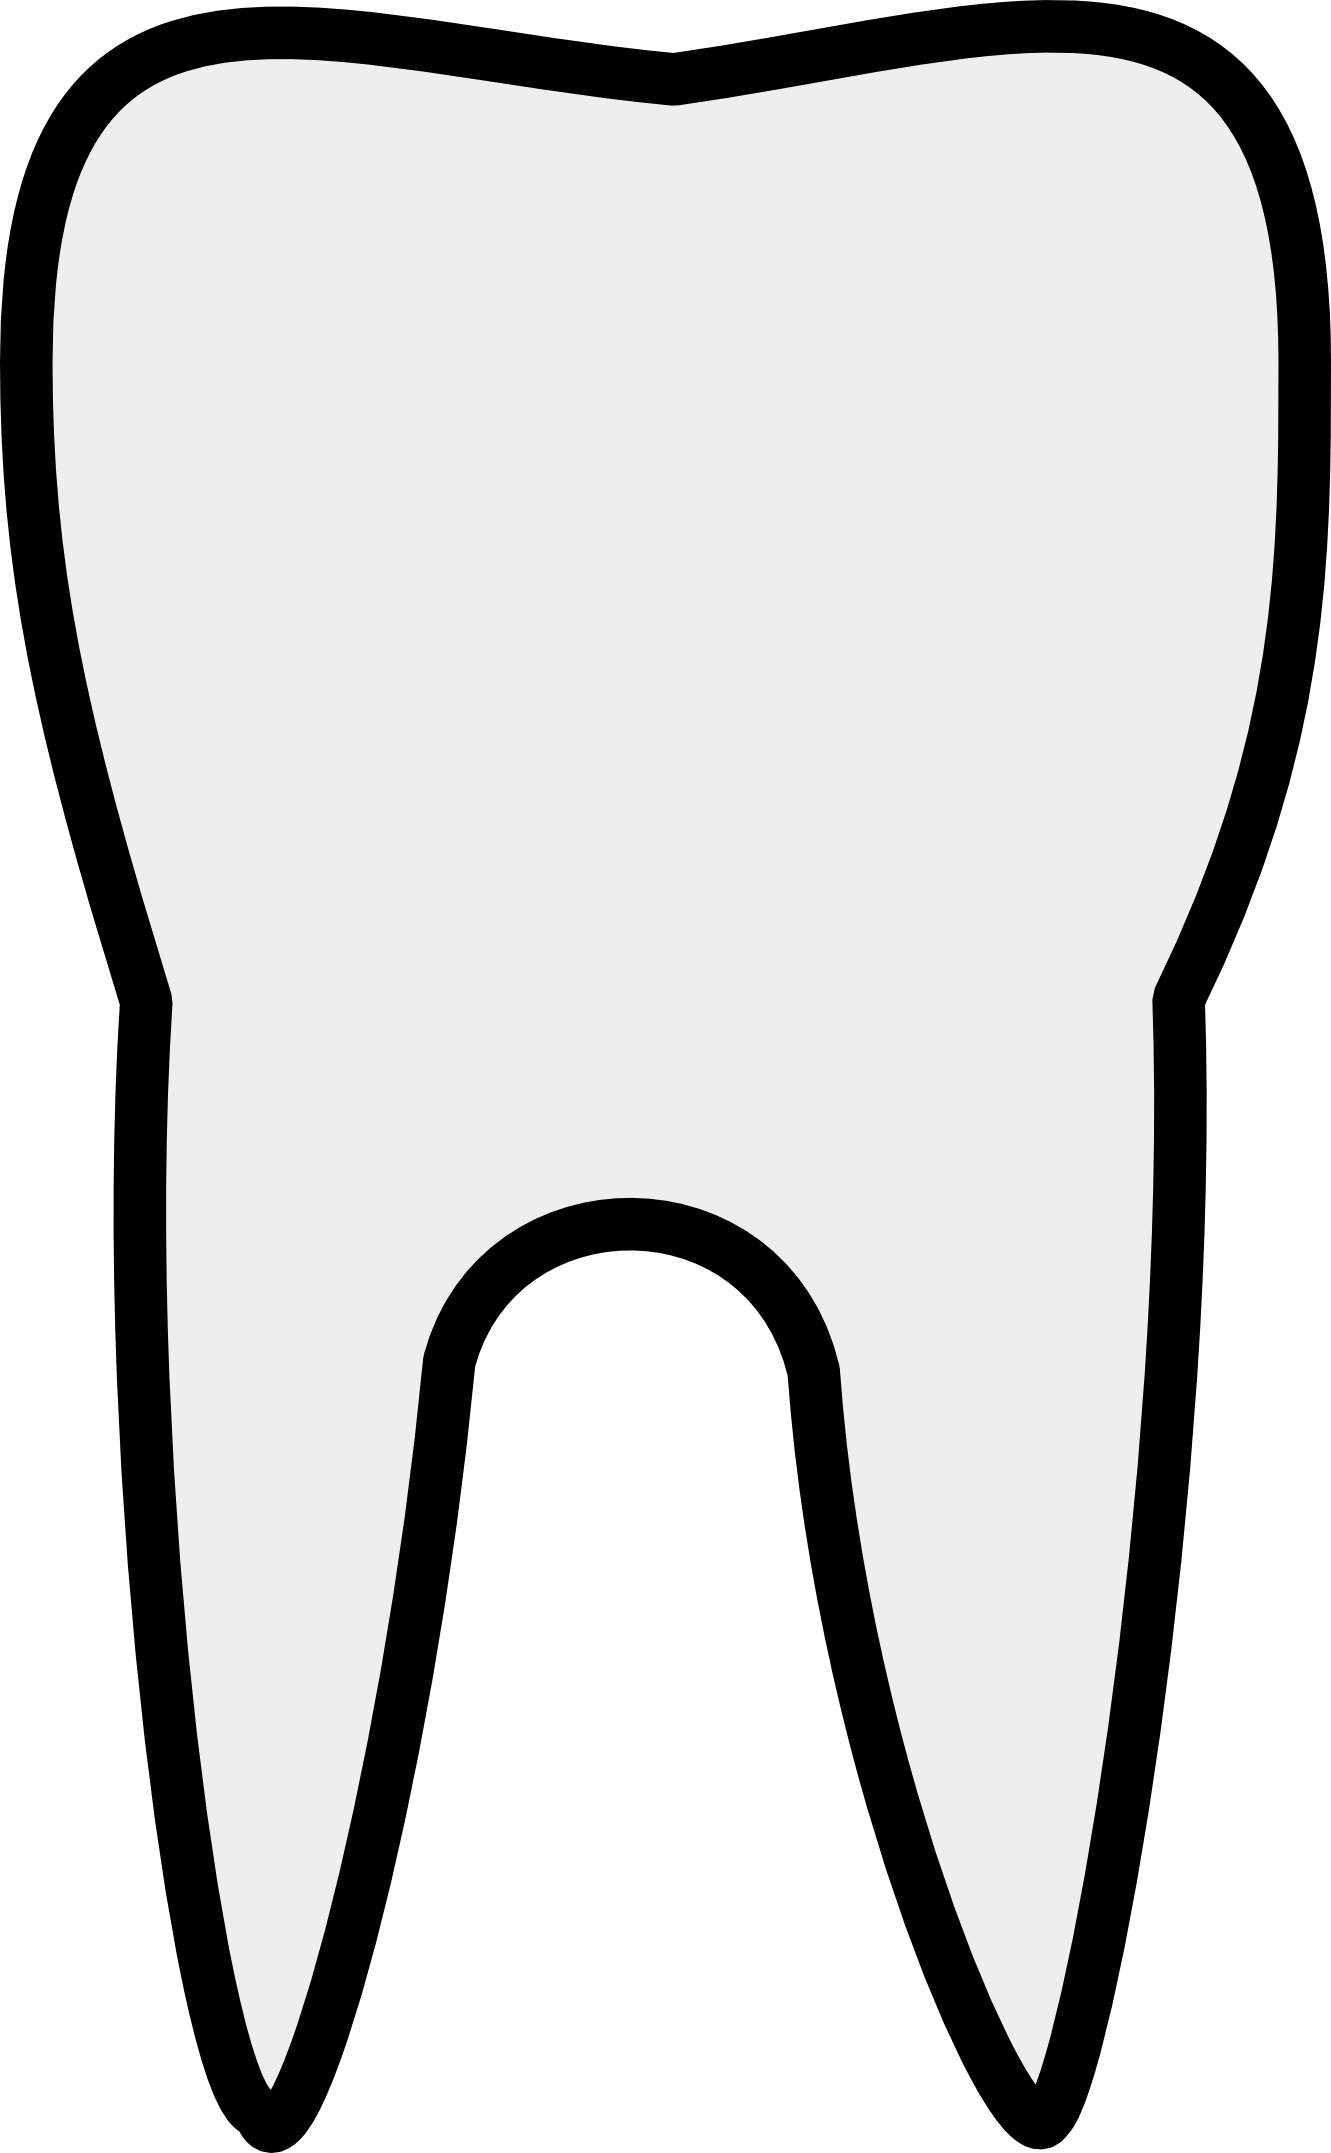 teeth clipart black and white clipart panda free clipart images rh clipartpanda com dental clipart black and white dental clipart free download